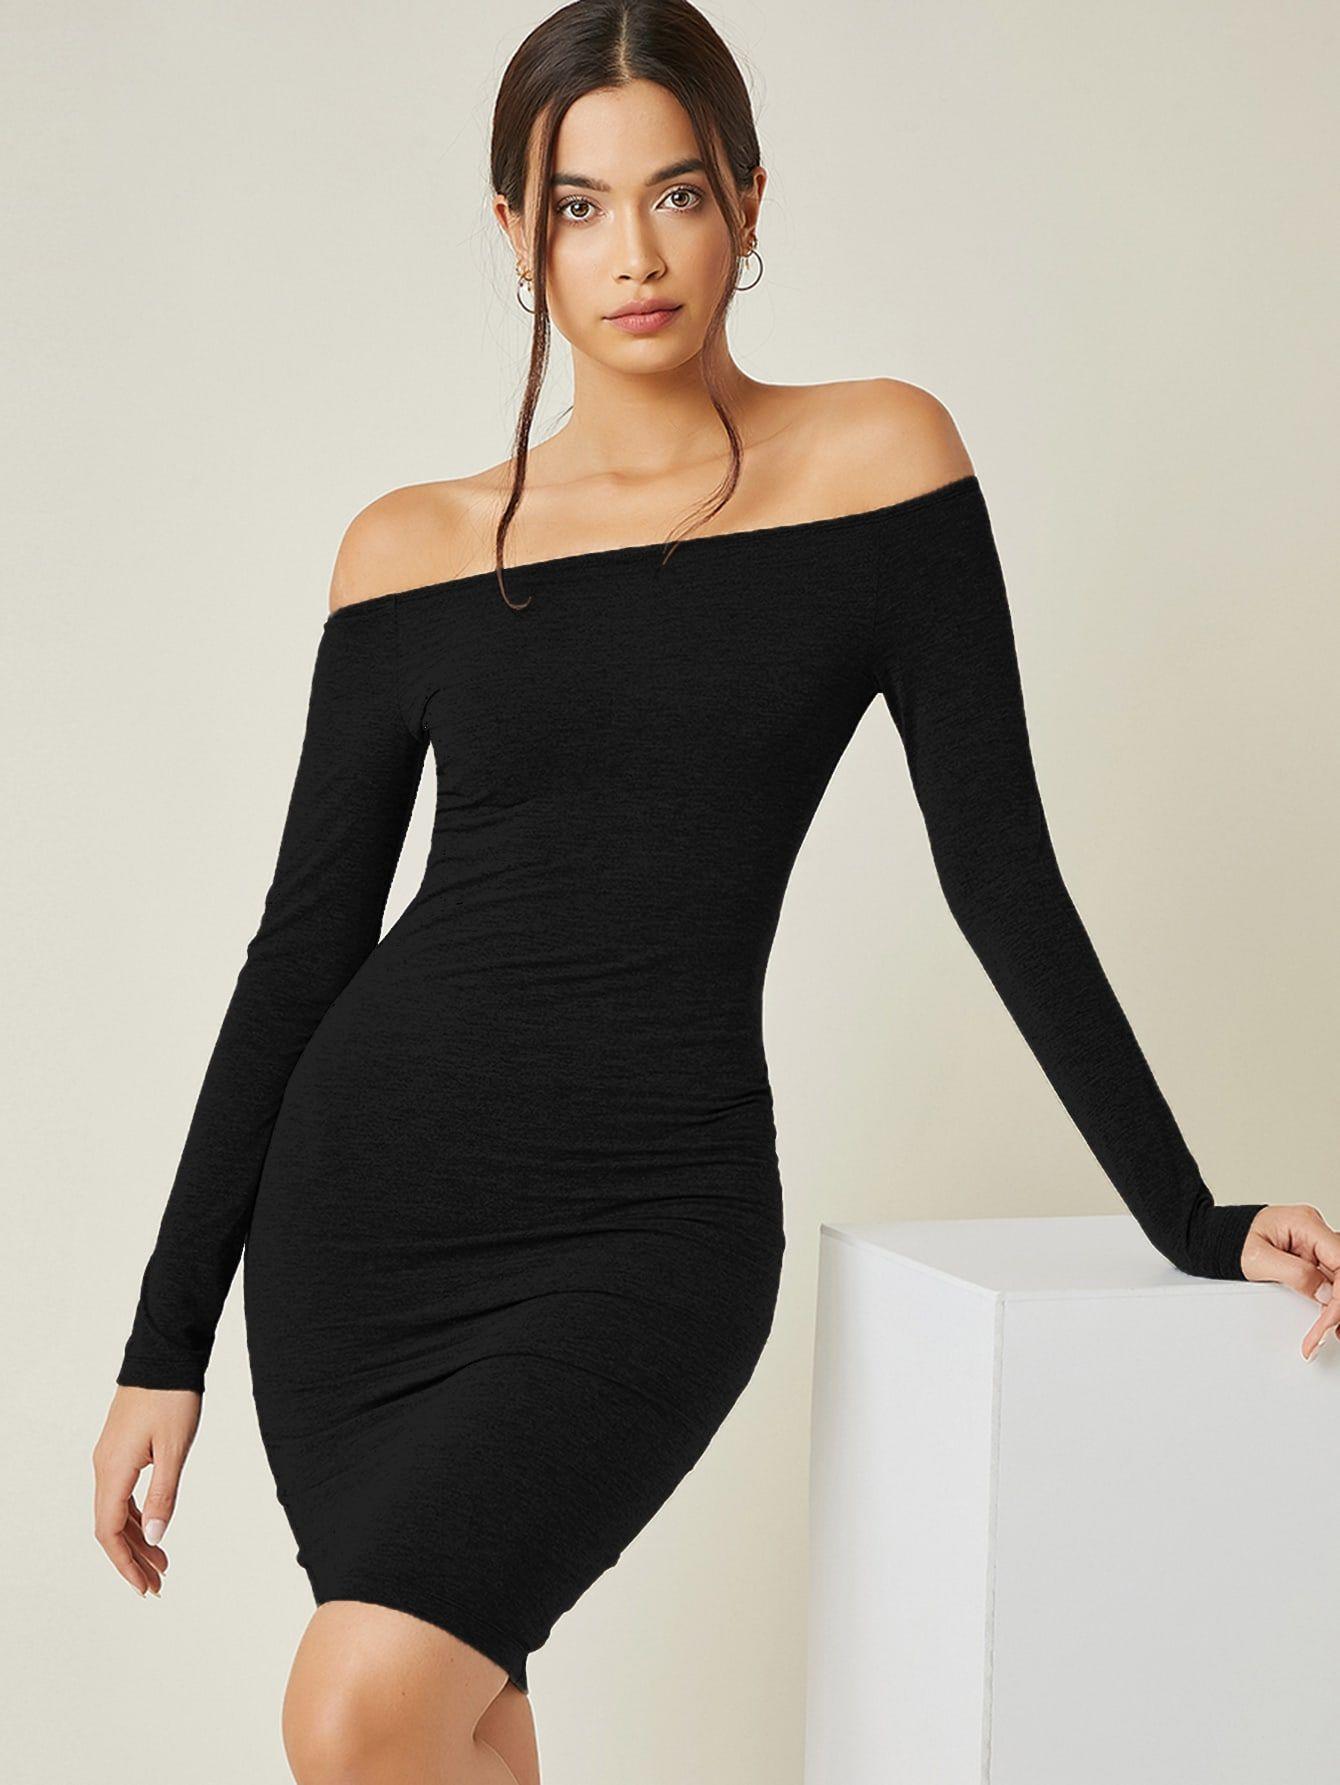 Solid Off Shoulder Bodycon Dress Shein Usa Bodycon Dress Bodycon Dress Formal Womens Trendy Dresses [ 1785 x 1340 Pixel ]